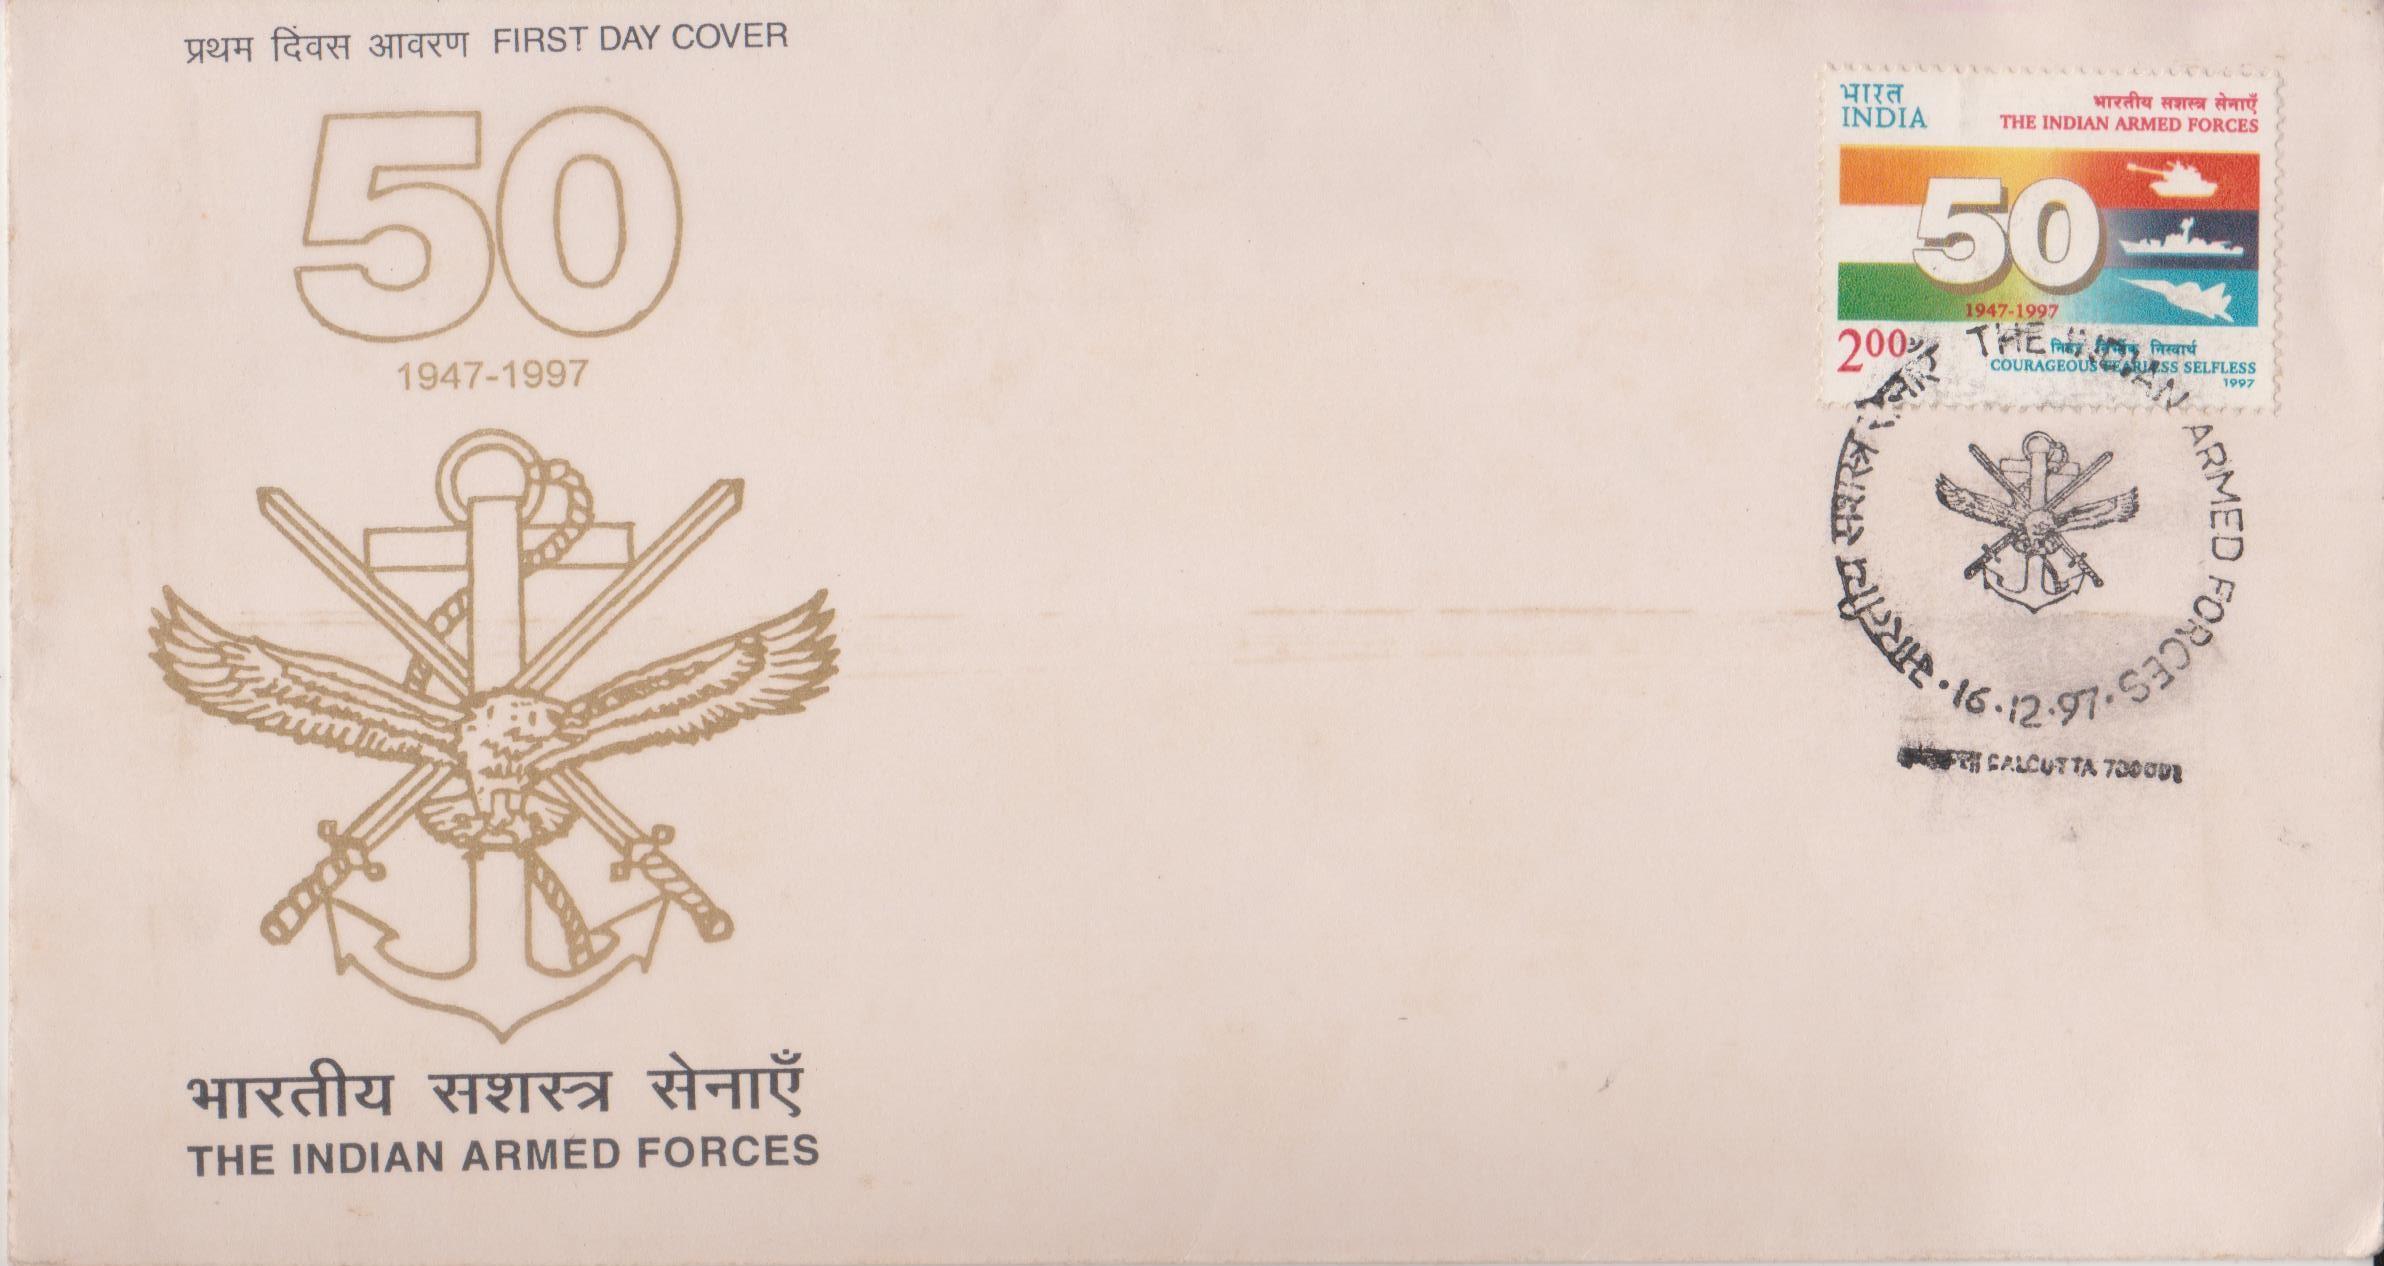 Bharatiya Sasastra Senaeṃ, joint services crest